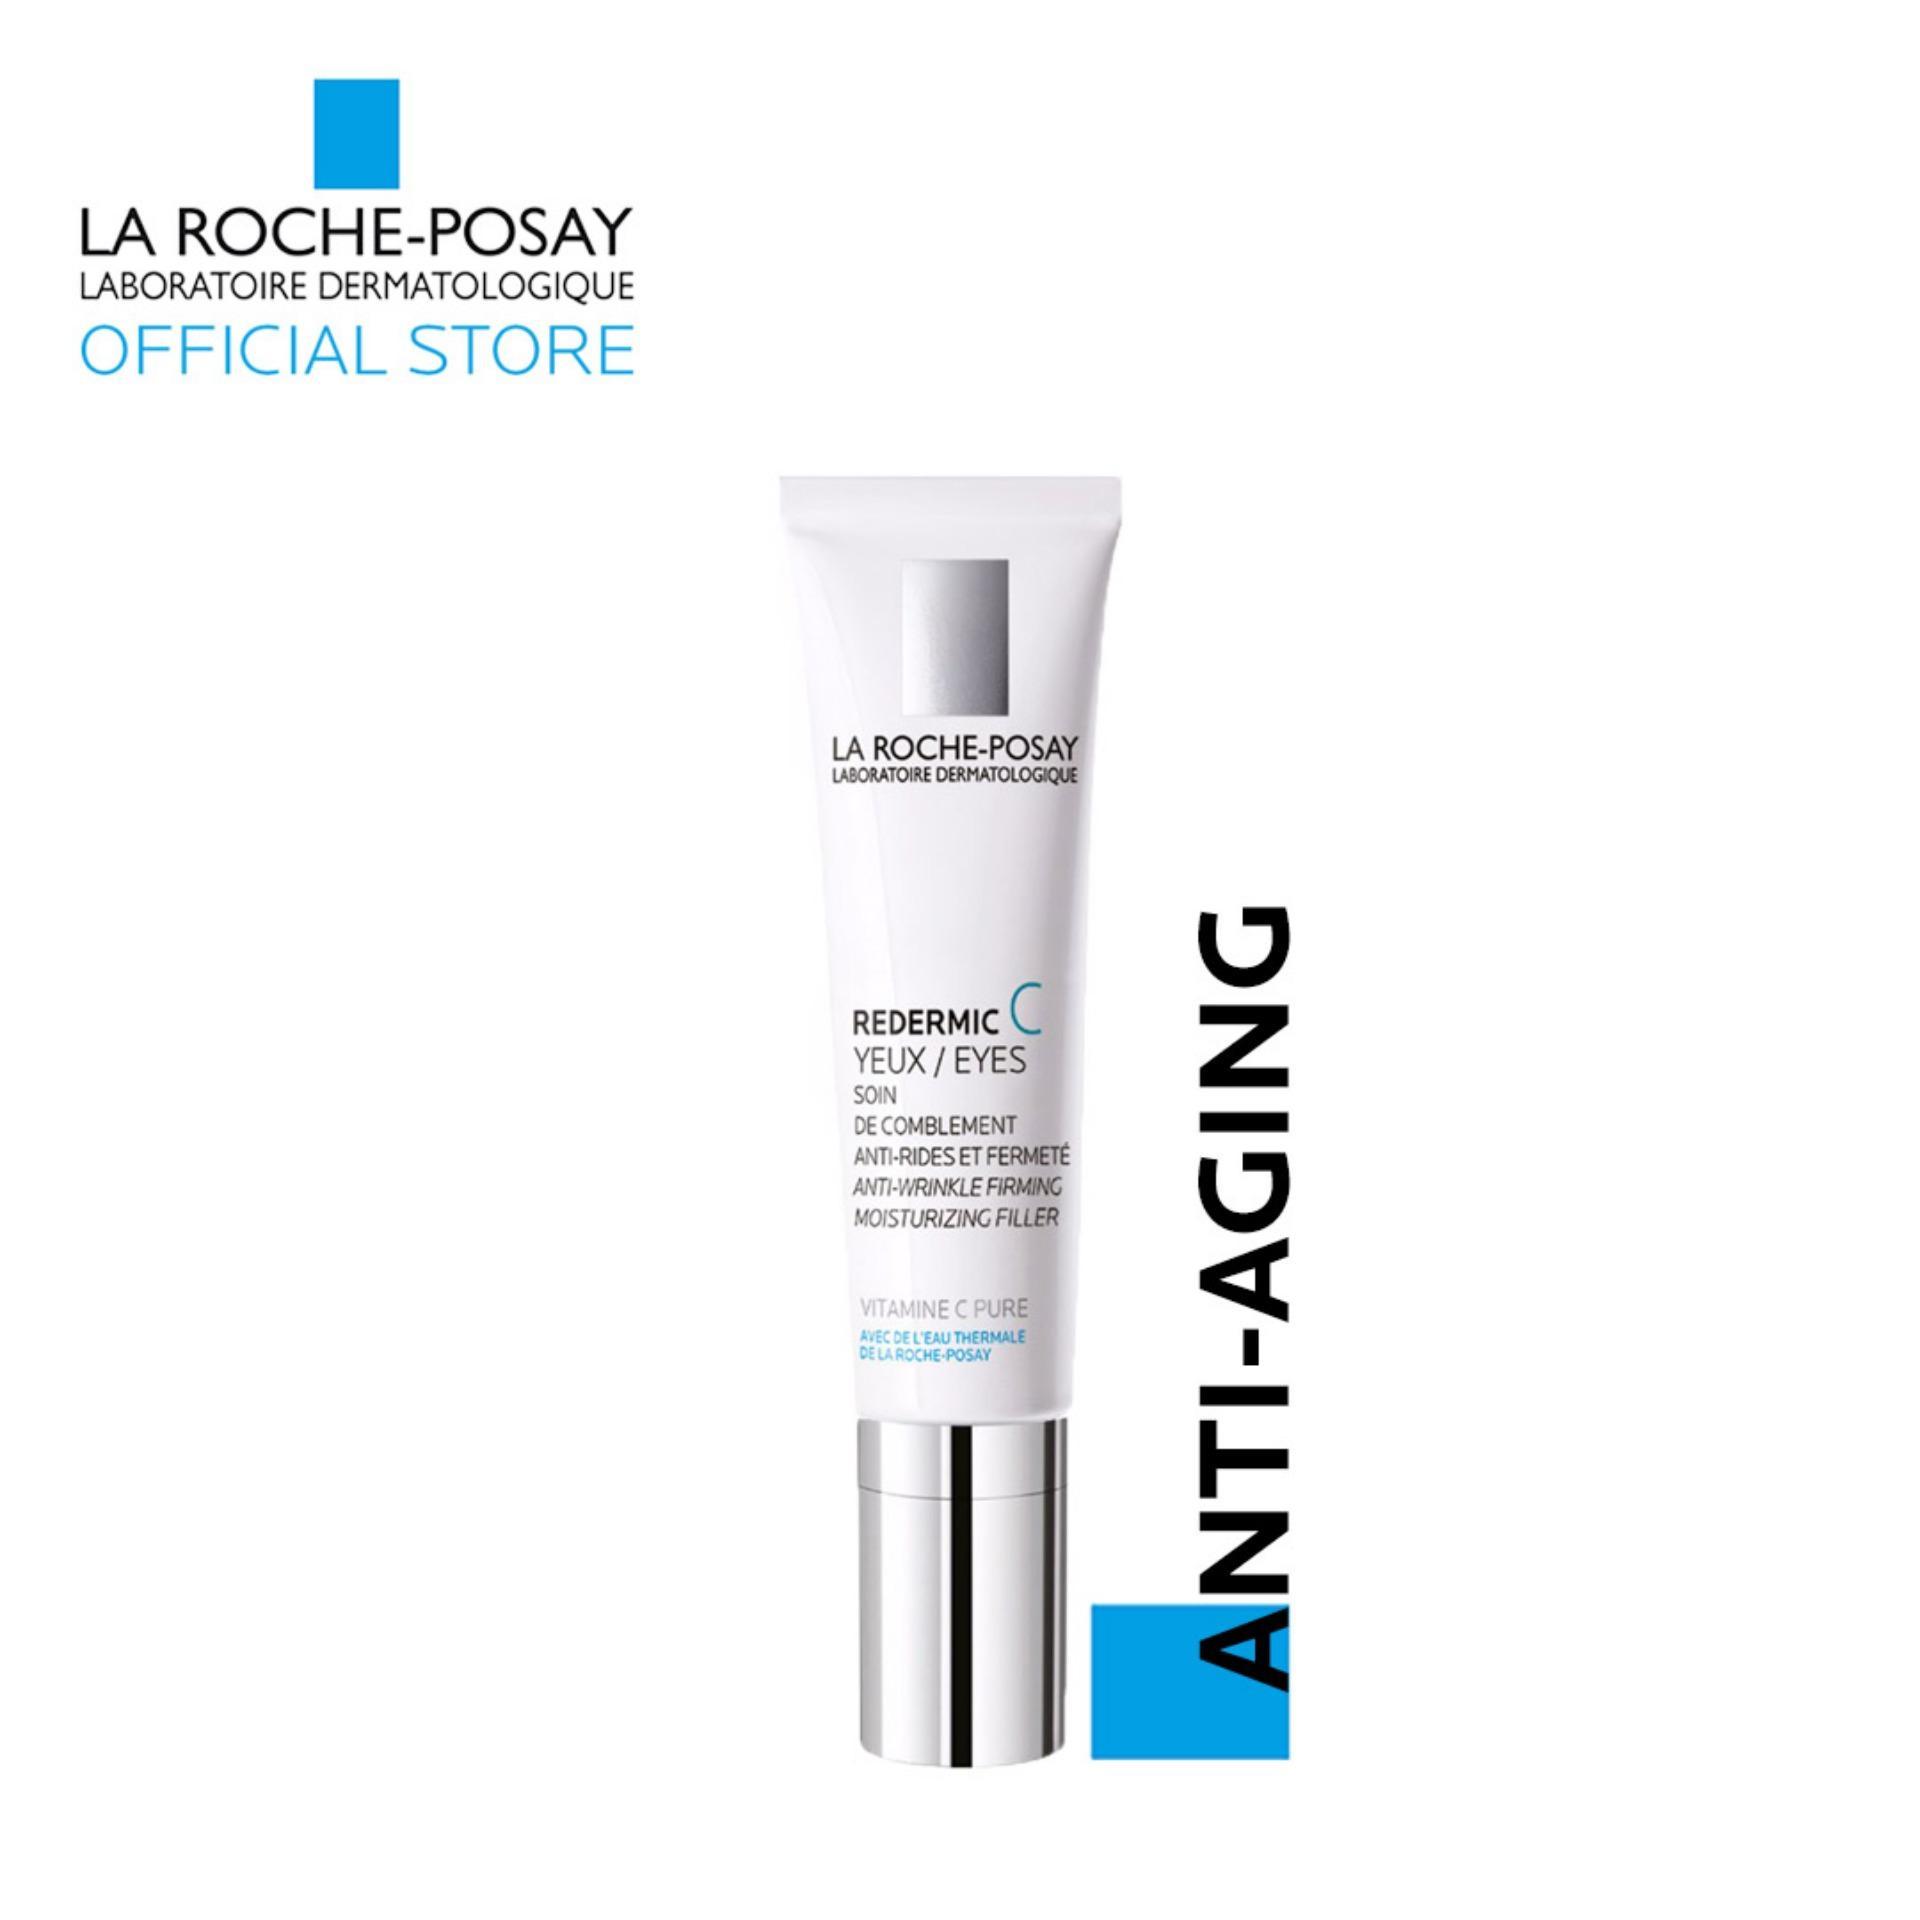 Buy Latest Eye Cream Online Skin Care Lazada Cosrx Honey Ceramide 30ml Redermic C 15ml Anti Aging By La Roche Posay